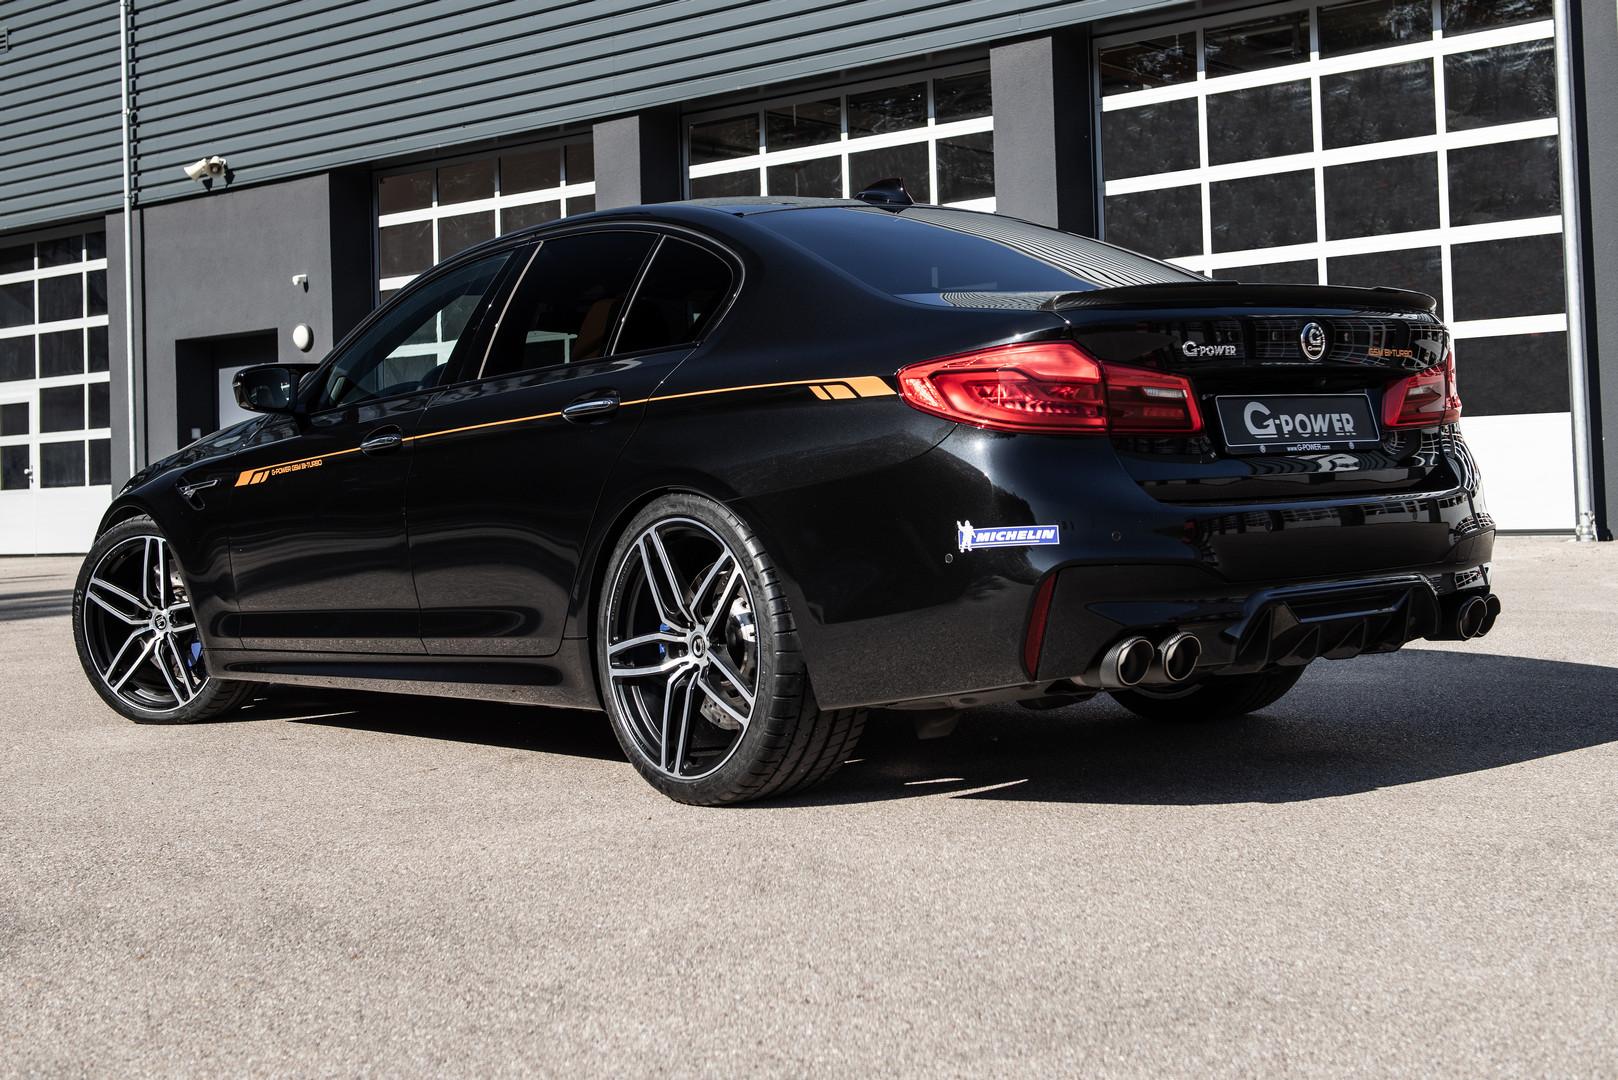 G-Power Unleashes 800hp BMW F90 M5 - GTspirit